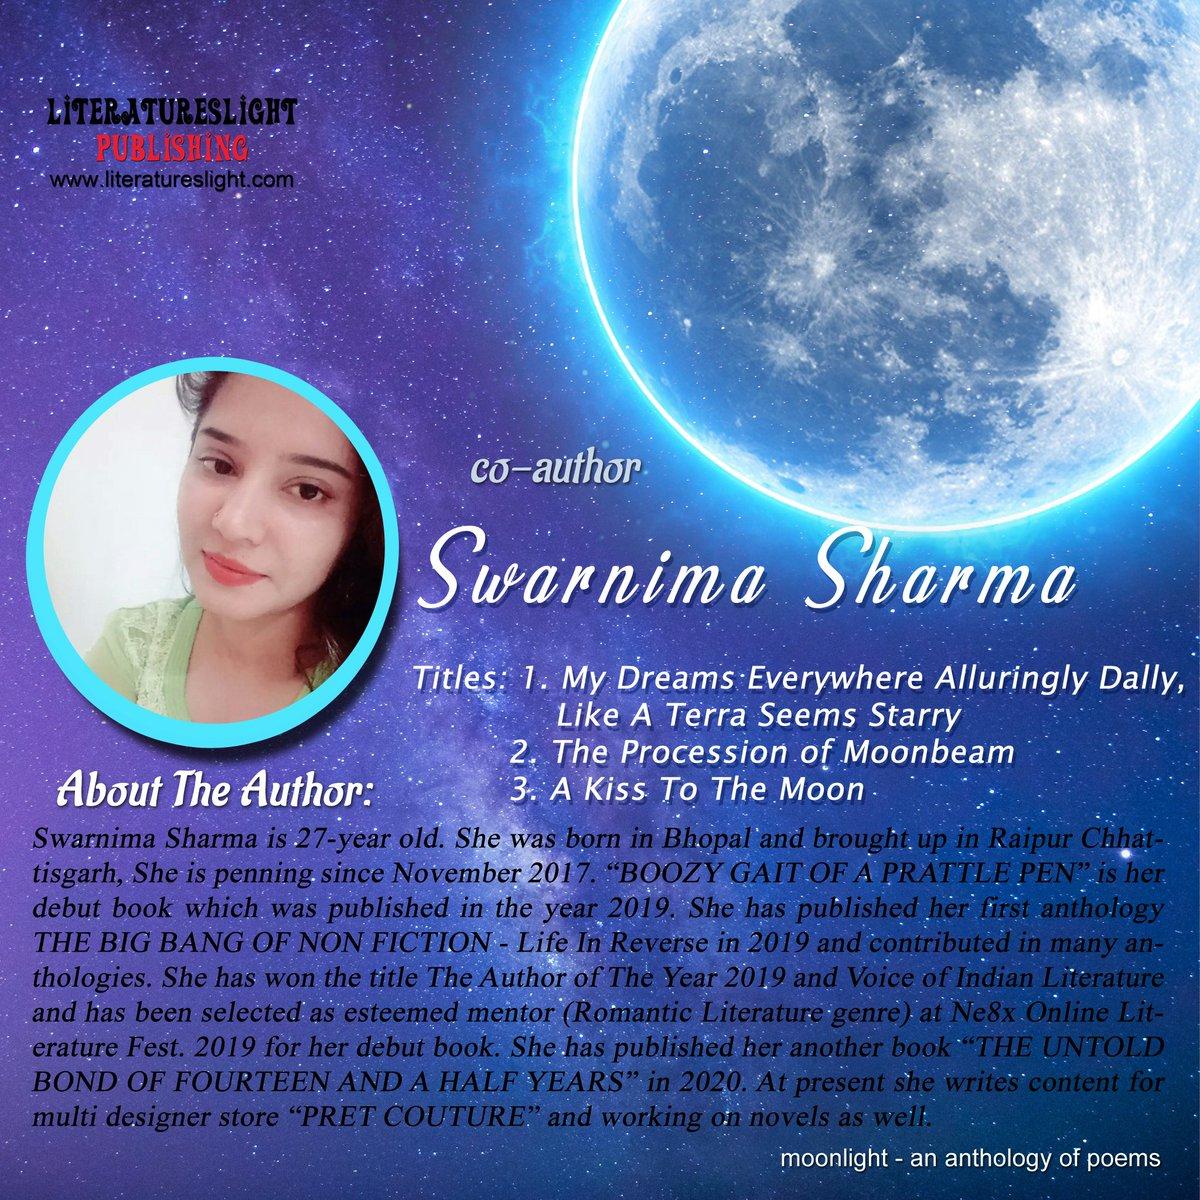 #literatureslight #poetryanthology #moonlight  Thank you for the contribution #SwarnimaSharma#poetry #booklovers #writeindia #newindianauthors #indianauthors #poetsofindia pic.twitter.com/xu8jjpn7UD